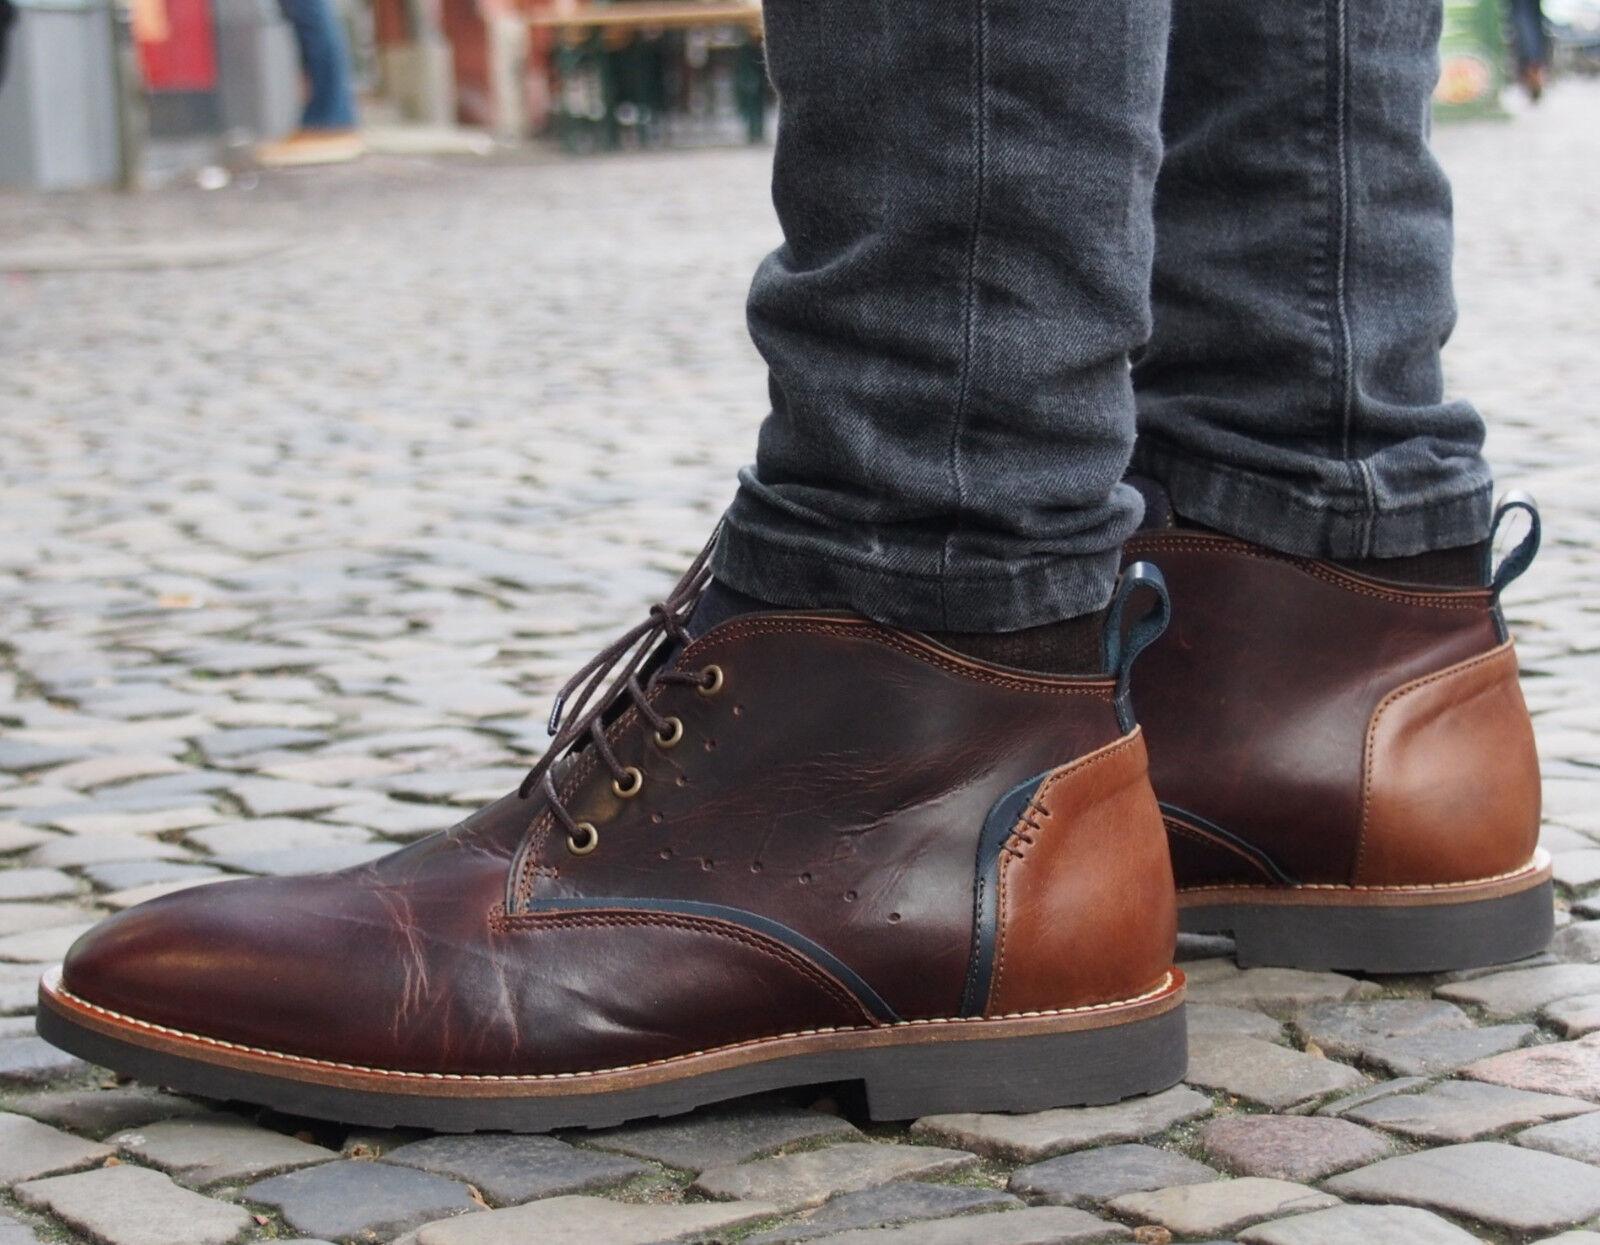 COXX BORBA Schuh MBOSTON604 braun Herrenschuhe Echtleder Schnürschuhe Business